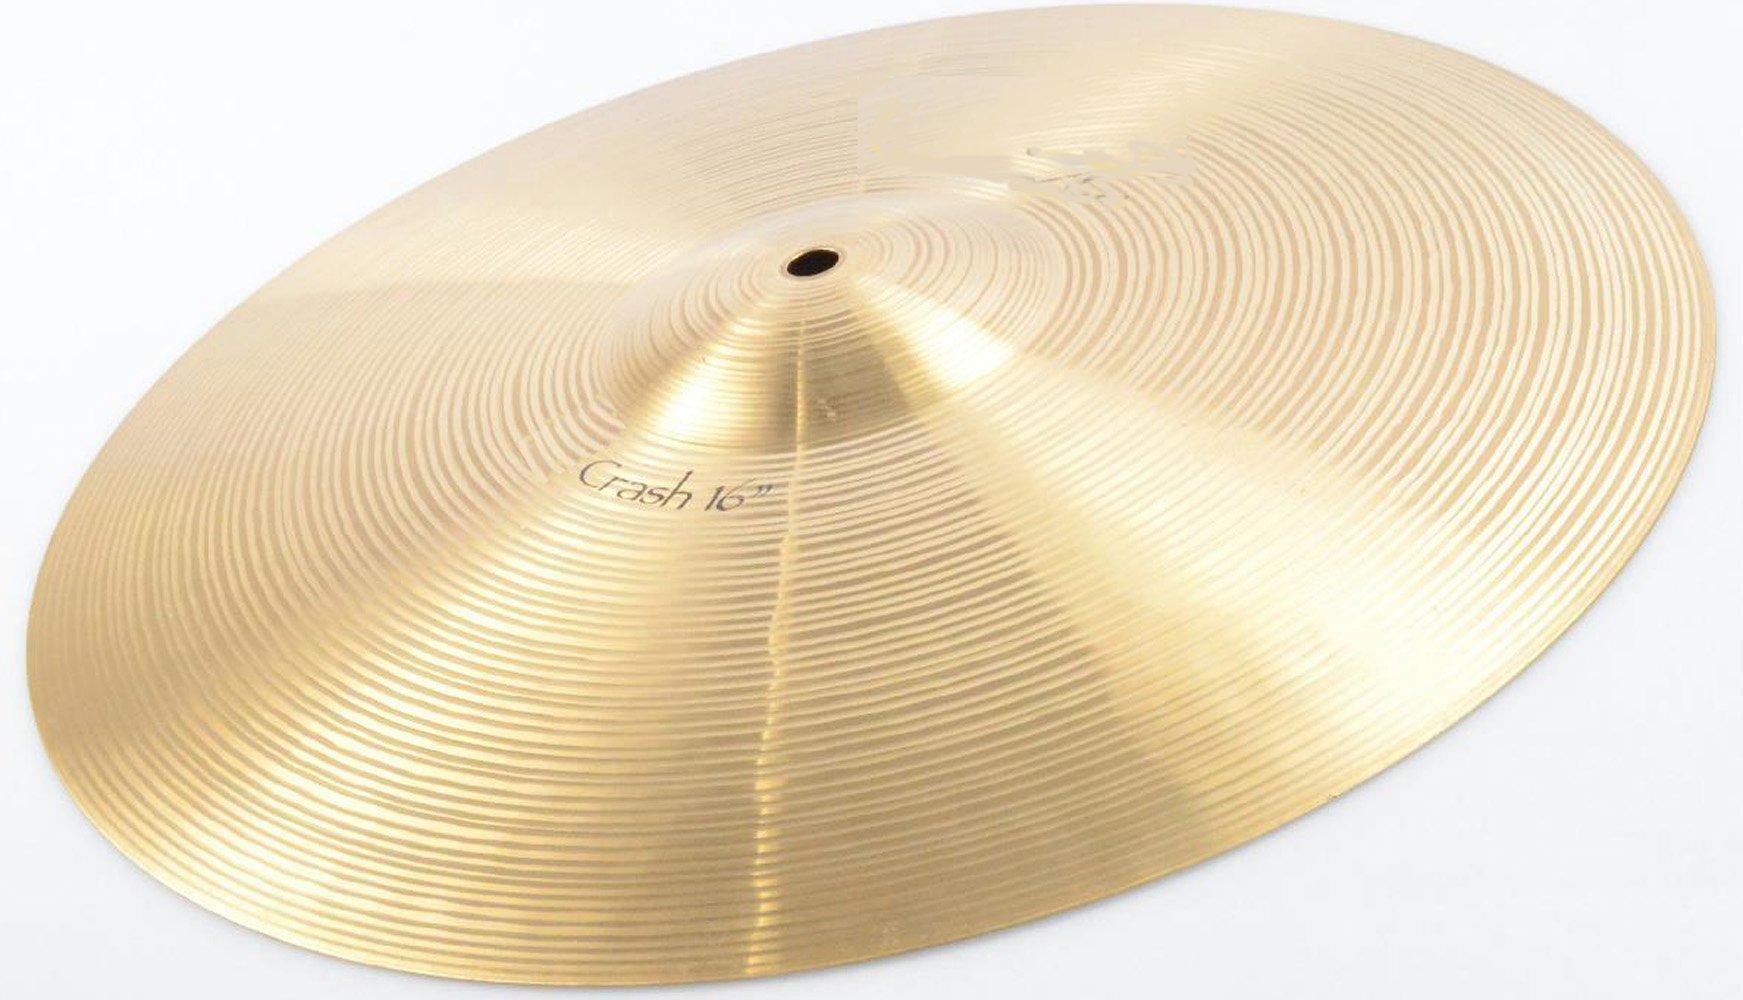 Performance Plus P316 16'' Crash Cymbal-Brass